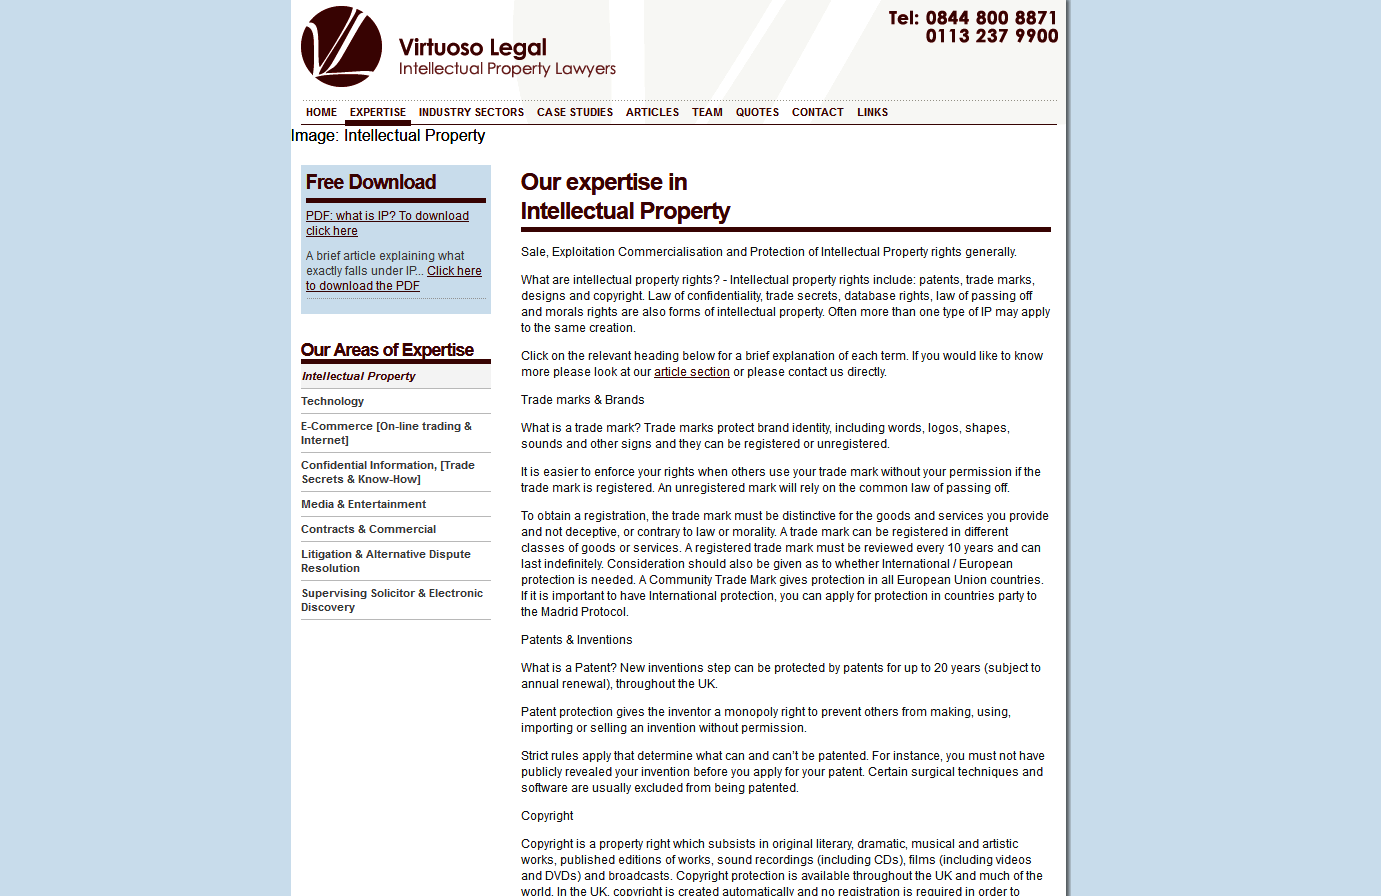 Law firm website - SEO III